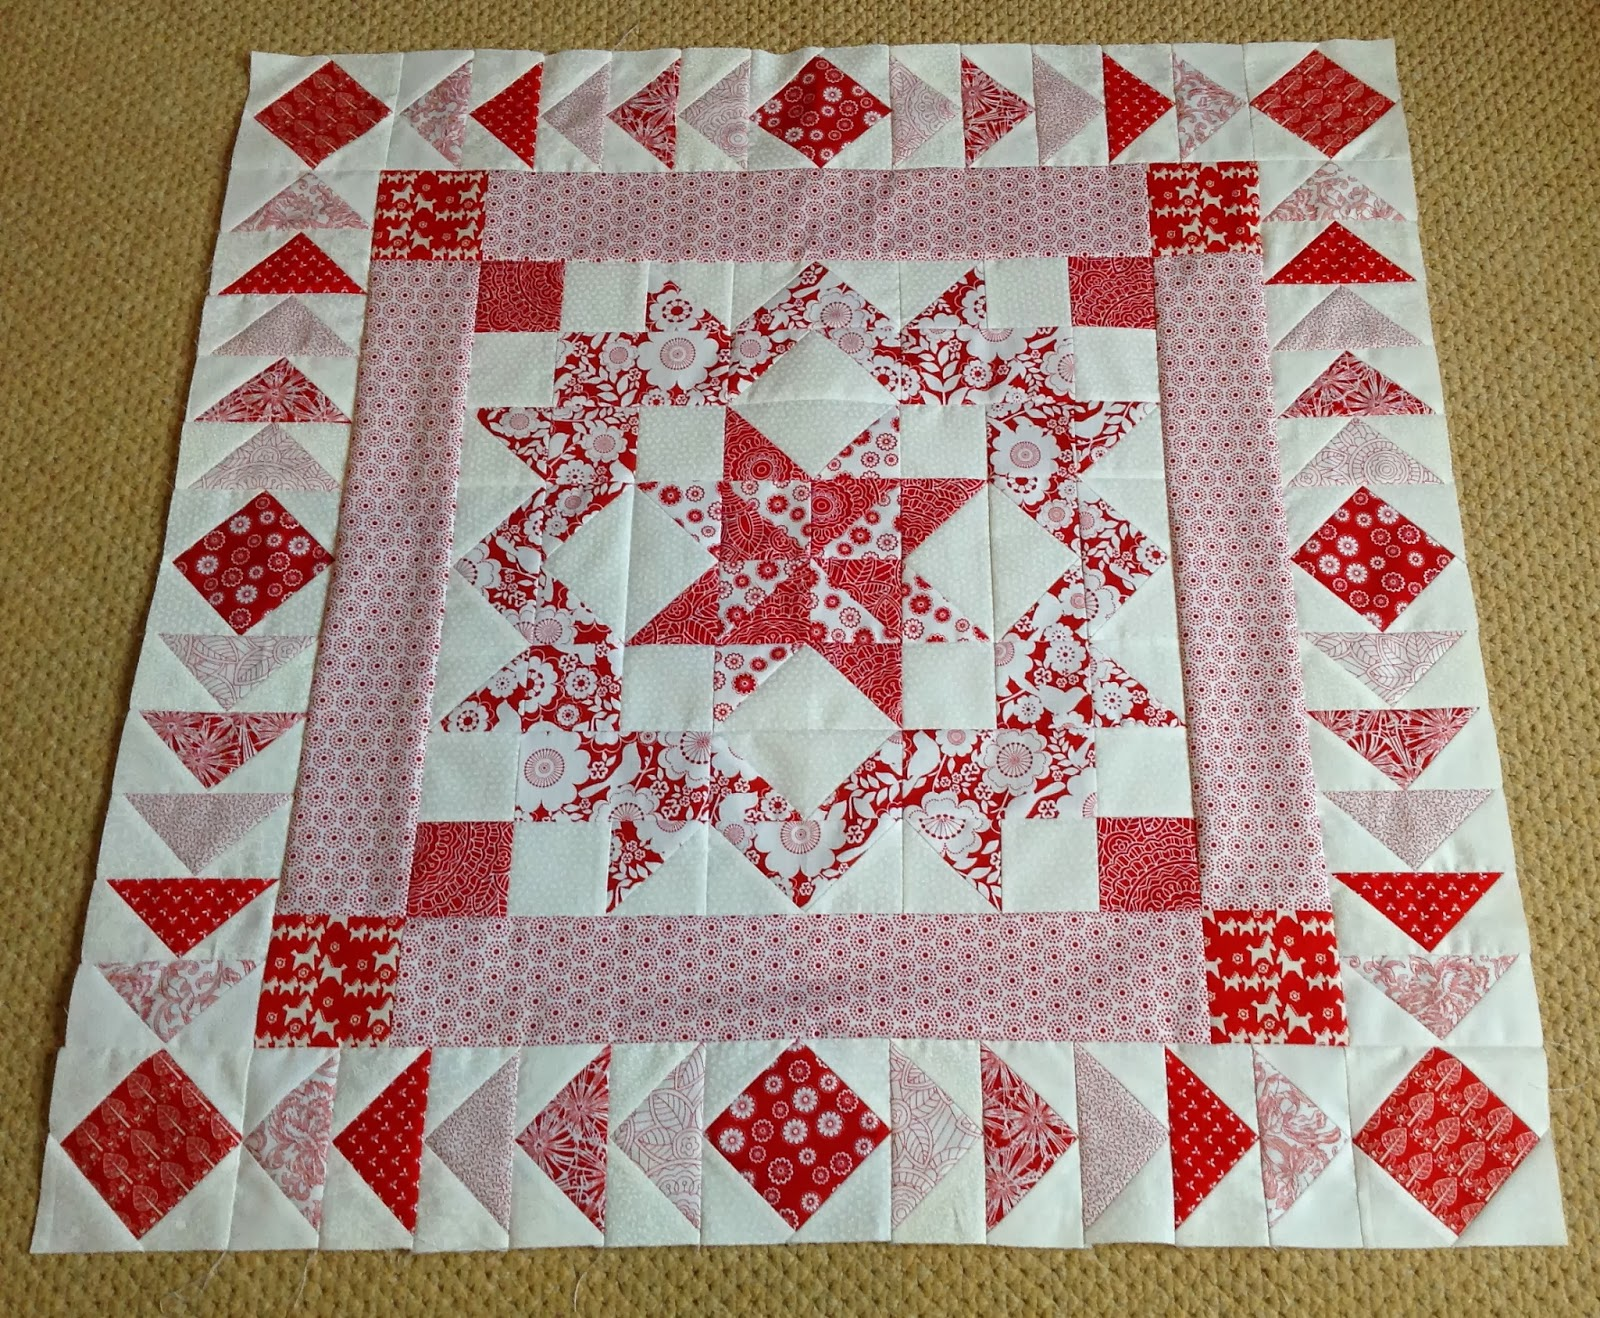 Sew Me: Mystery Medallion Quilt - Border 2 : quilt border - Adamdwight.com